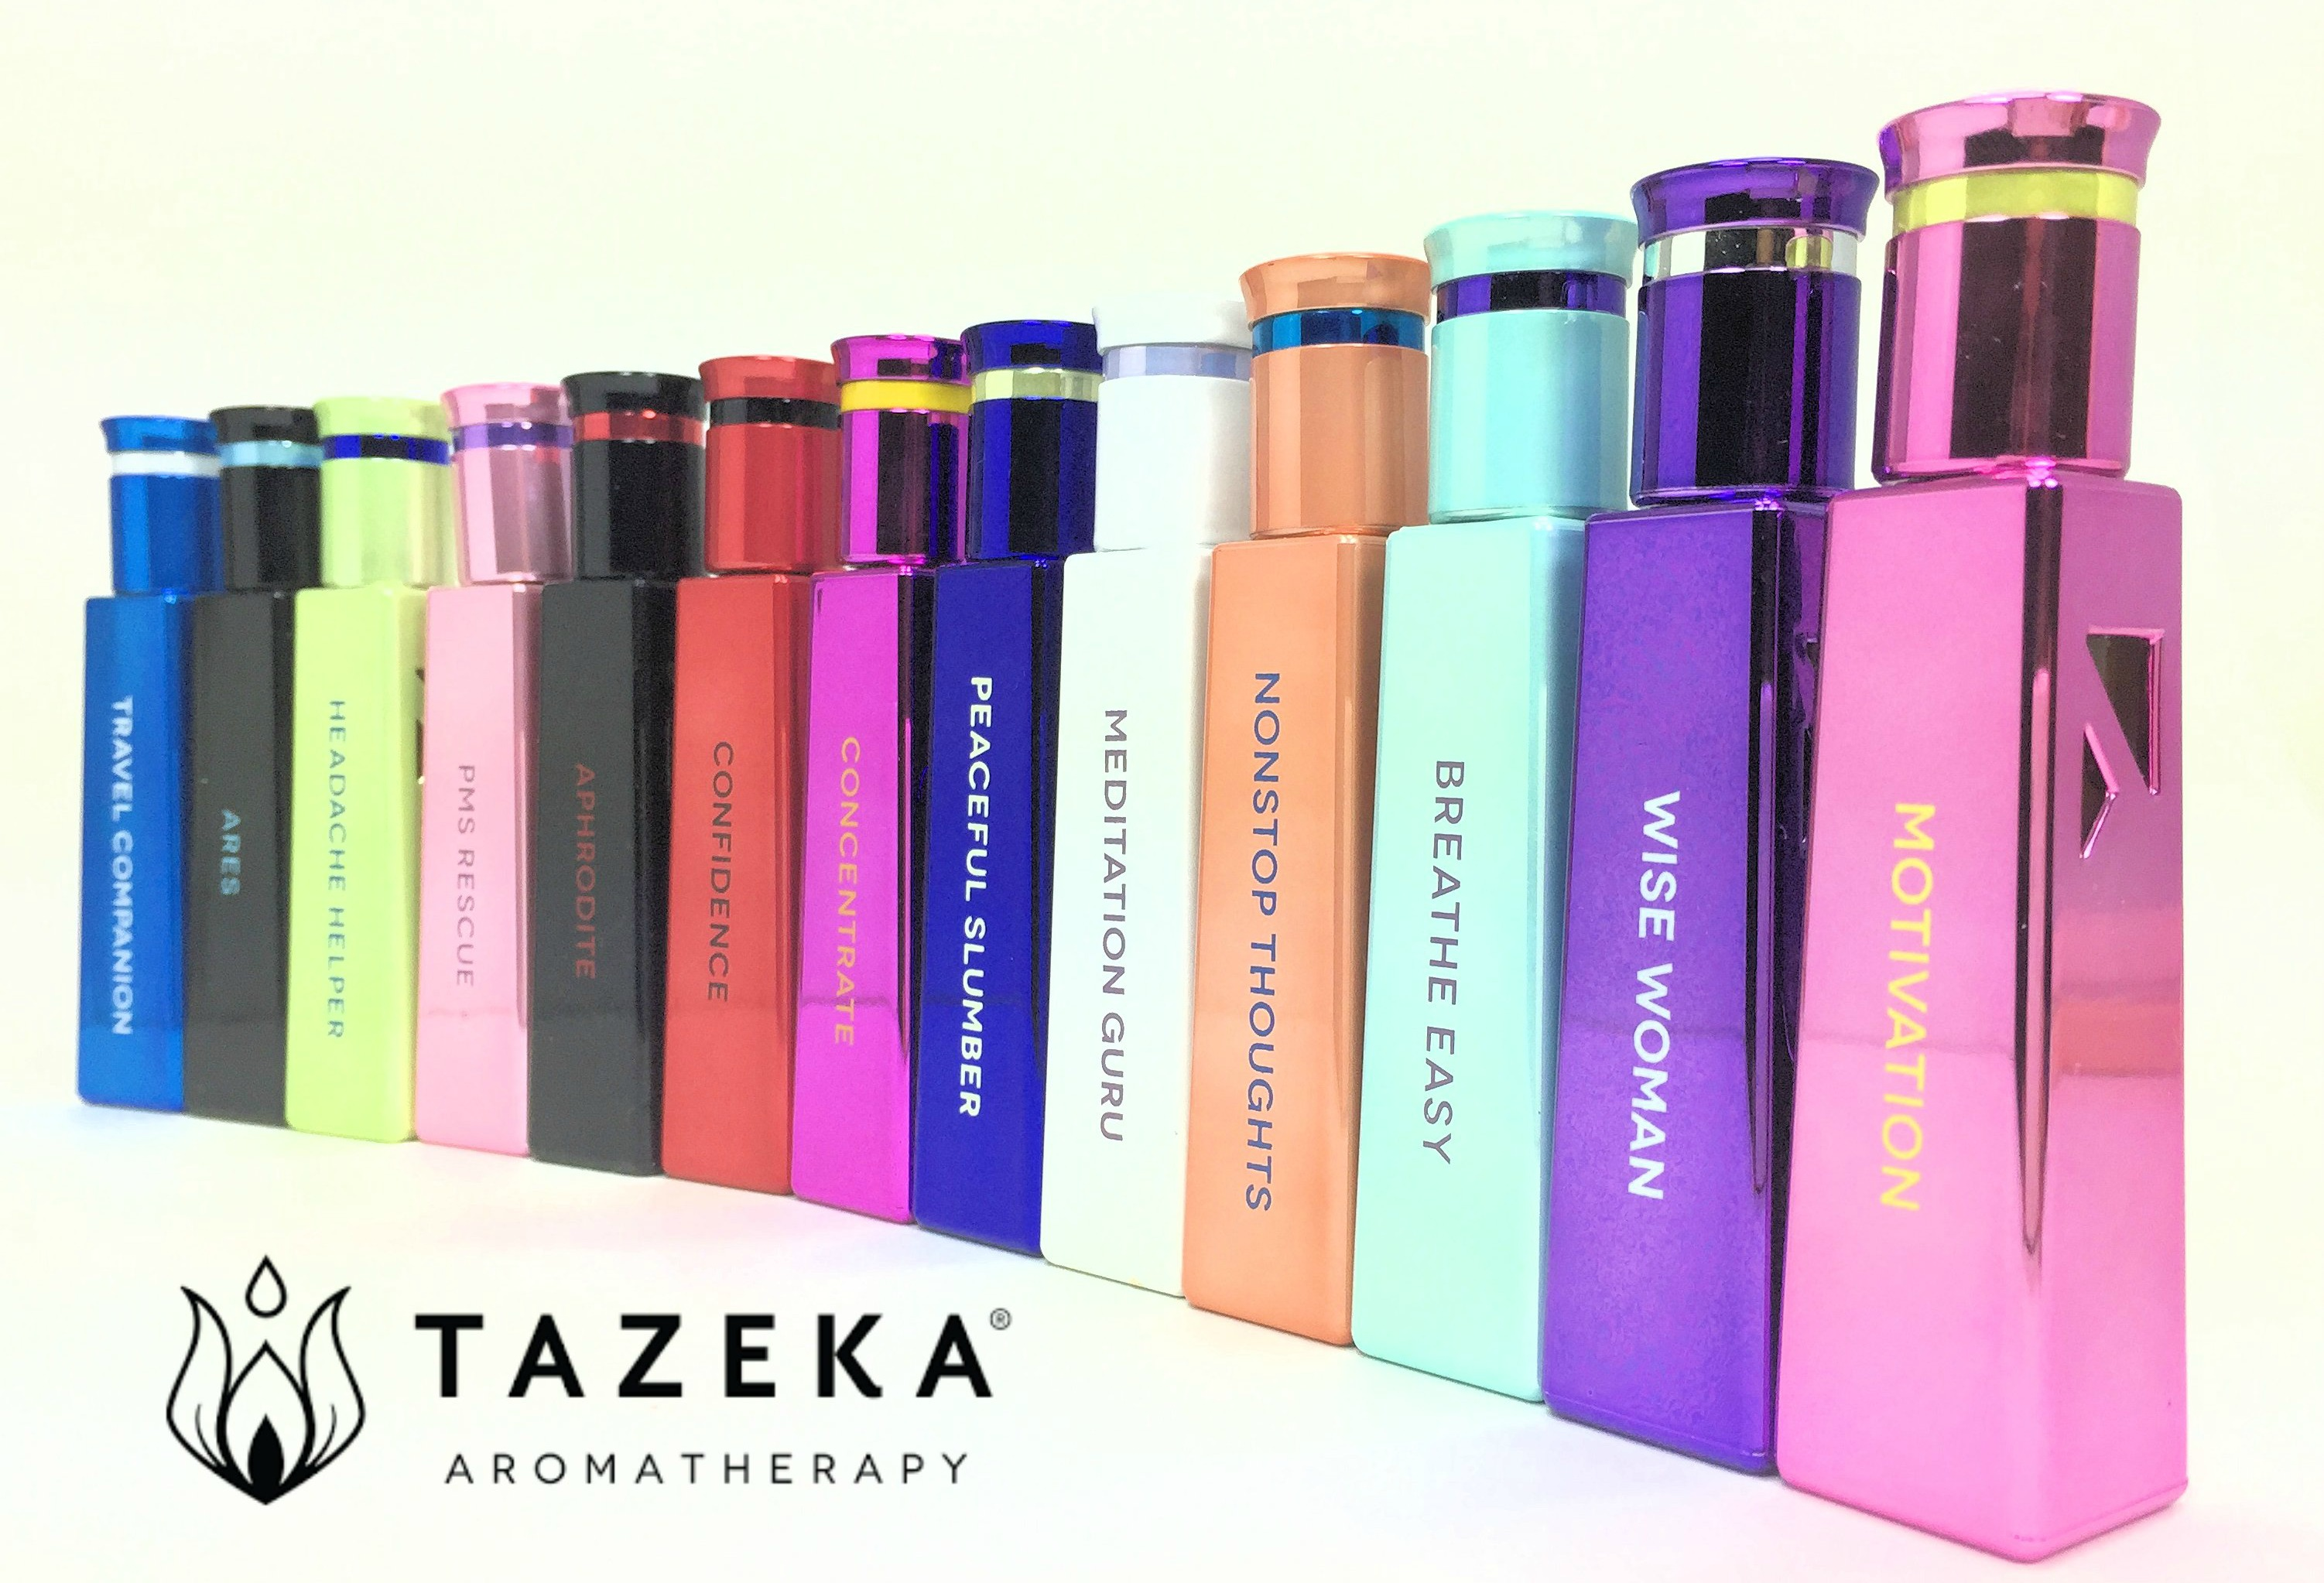 tazeka-aromatherapy